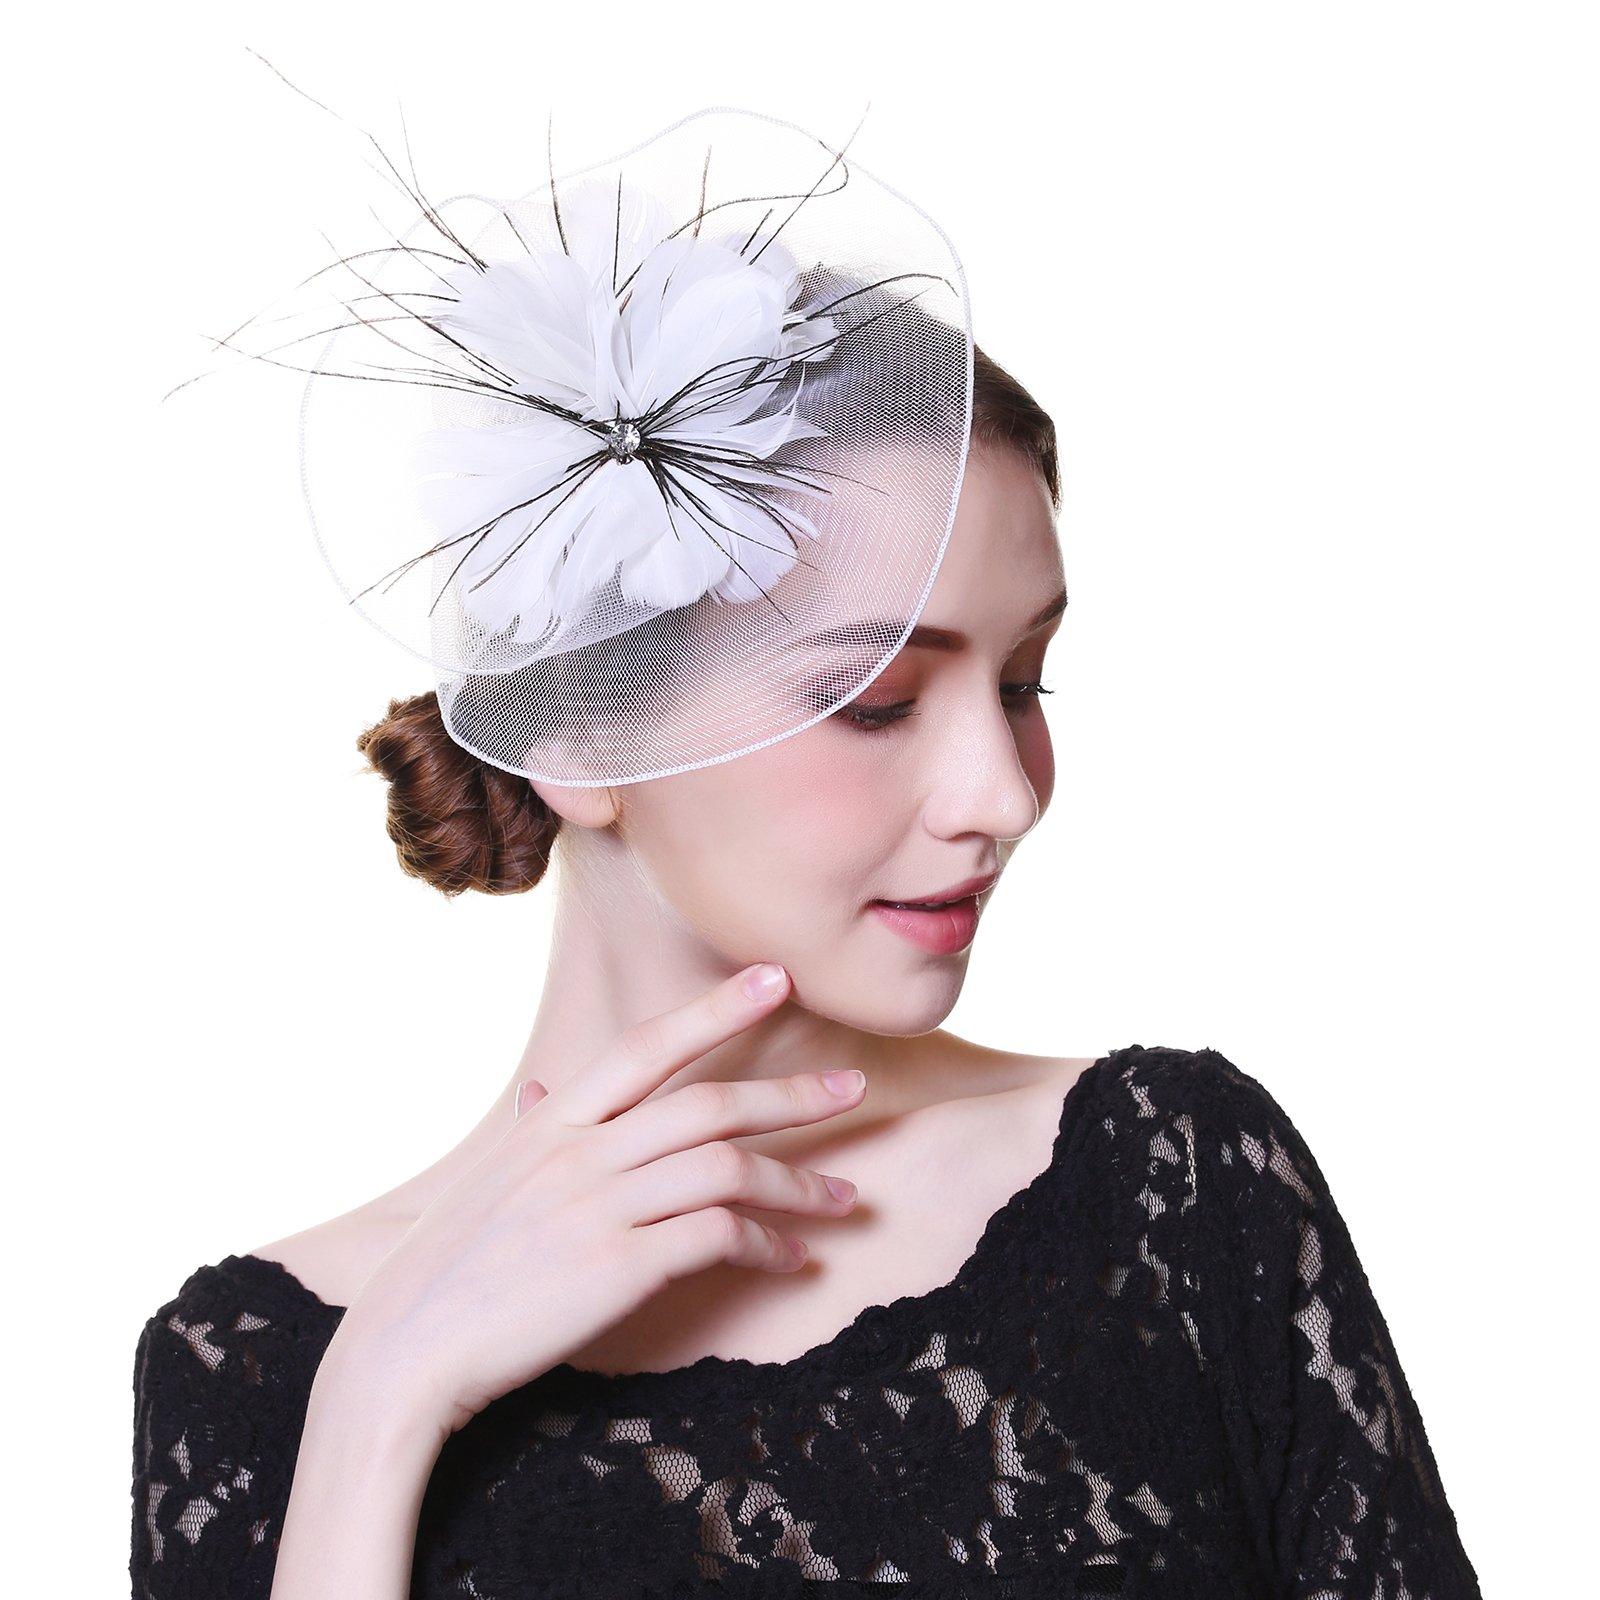 Fascinator Hat Mesh Flower Headwear – AWAYTR Feathers on The Top Woman Mesh Derby Church Cap